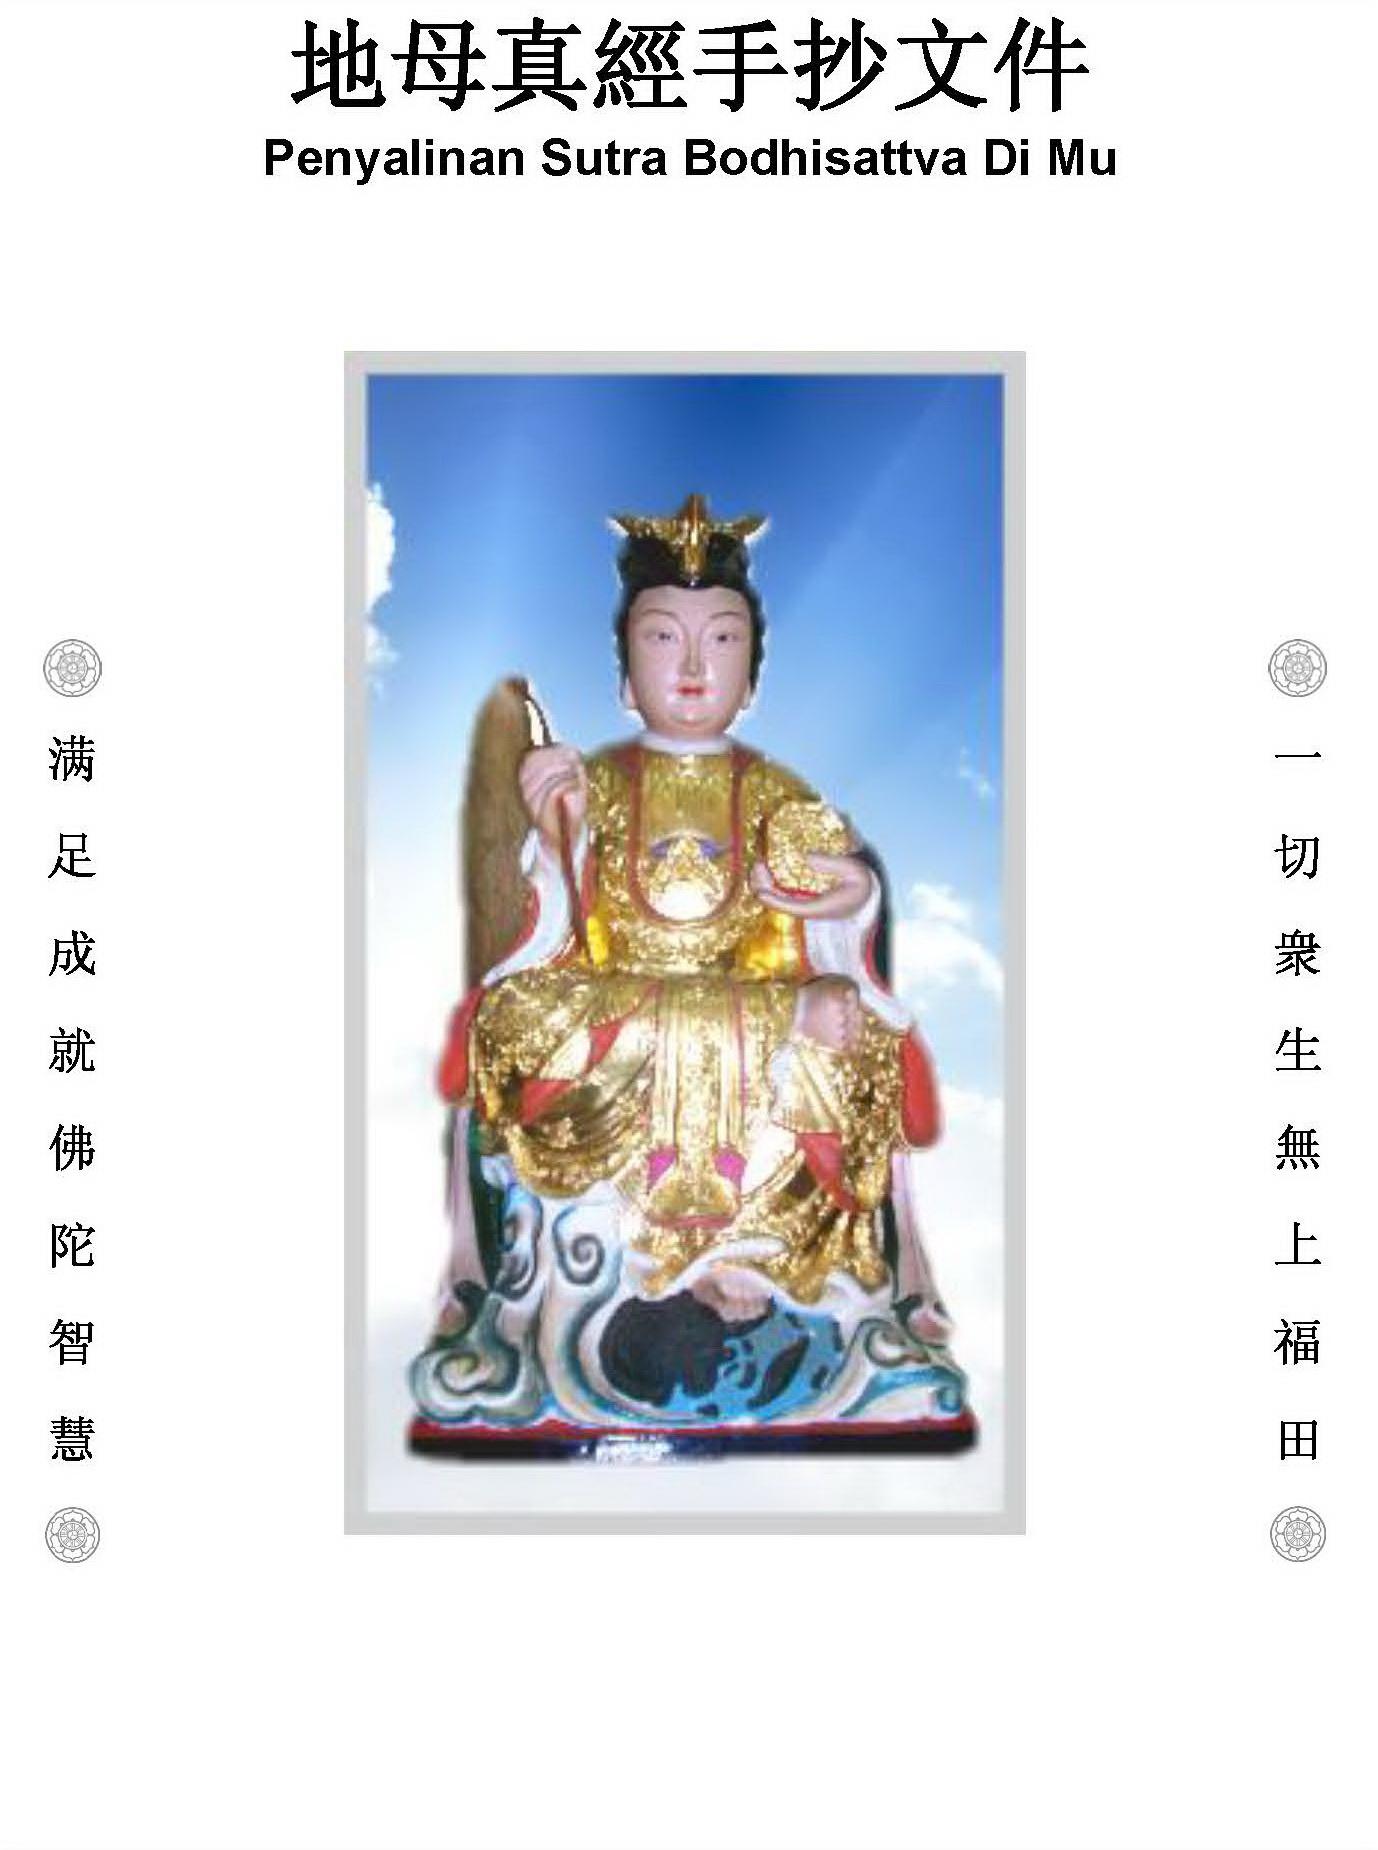 salin sutra bodhisattva dimu 2 Penyalinan Sutra